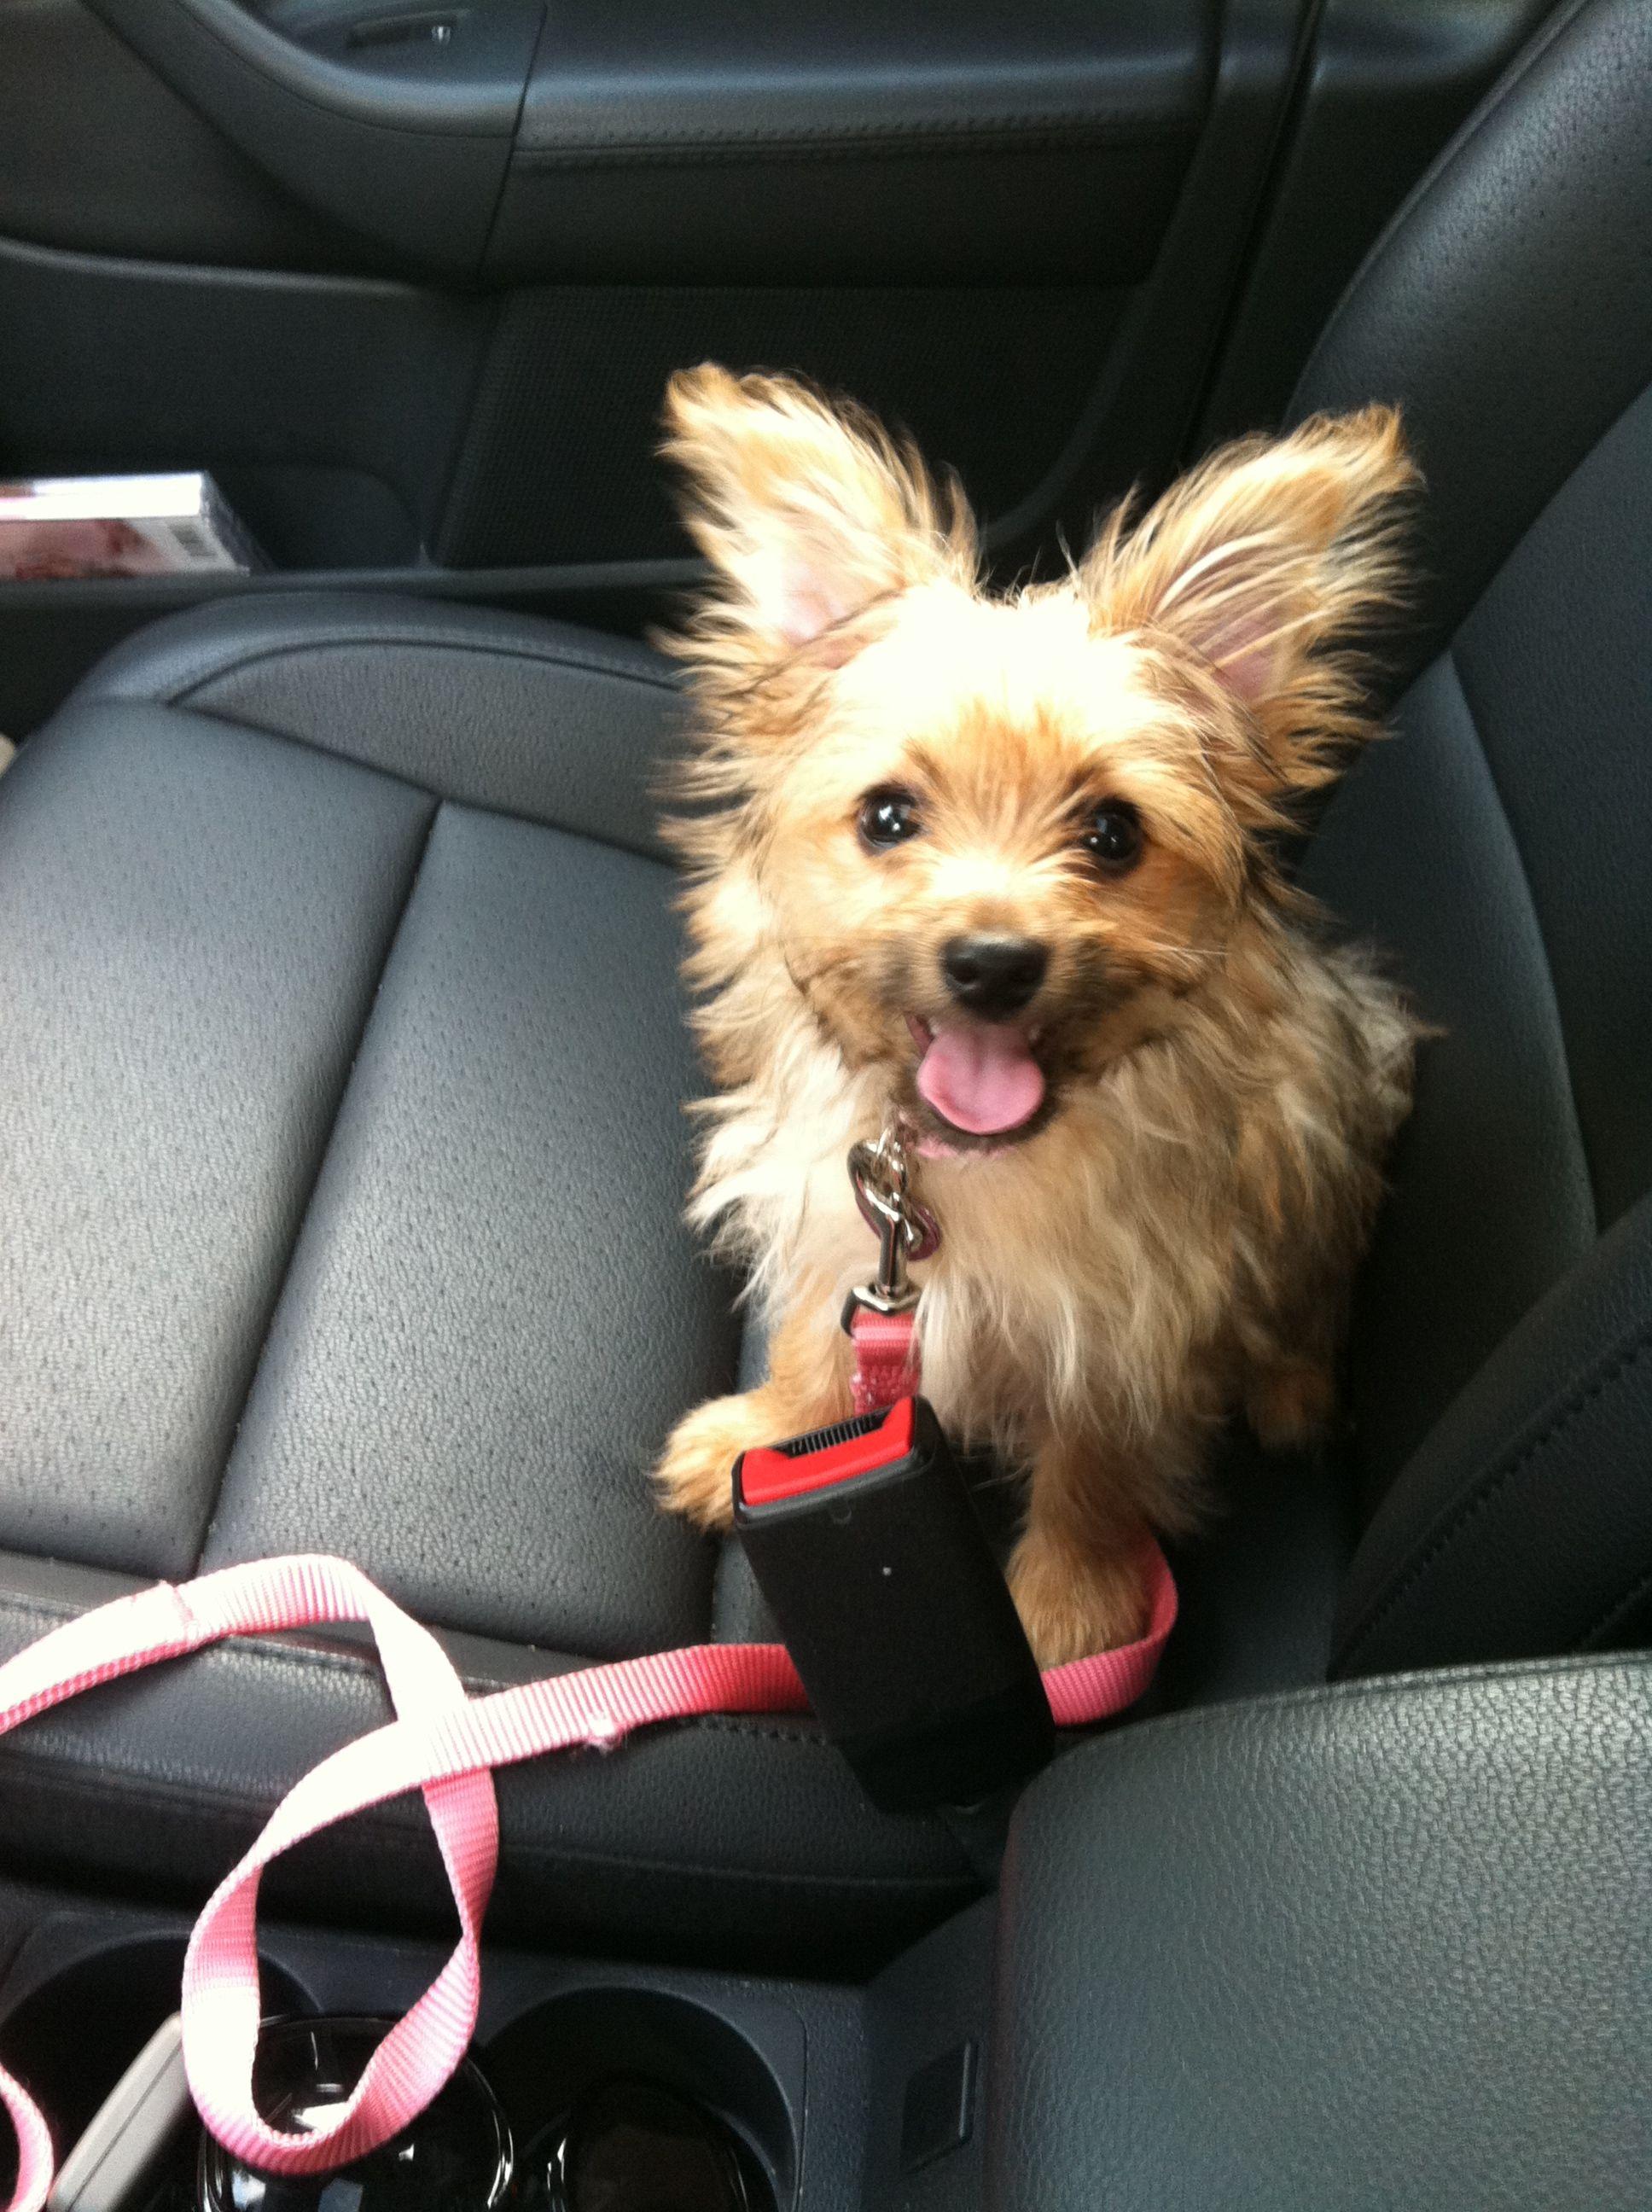 Summer my Chorkie last year loving the car! Cute dogs